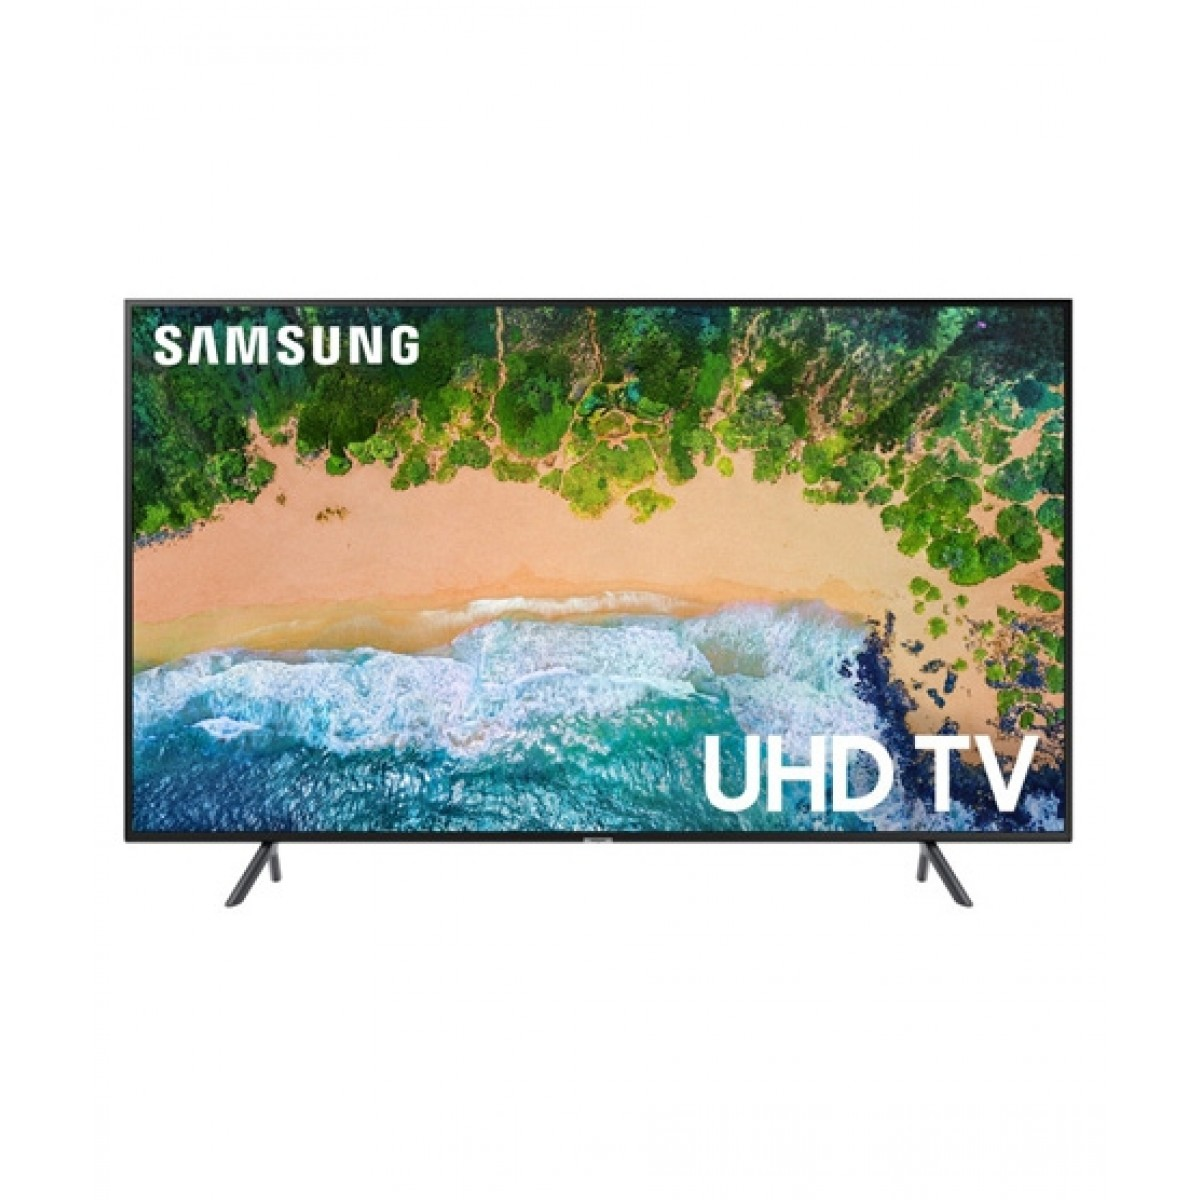 "Samsung 43"" 4K UHD Smart LED TV (43NU7100) - Without Warranty"